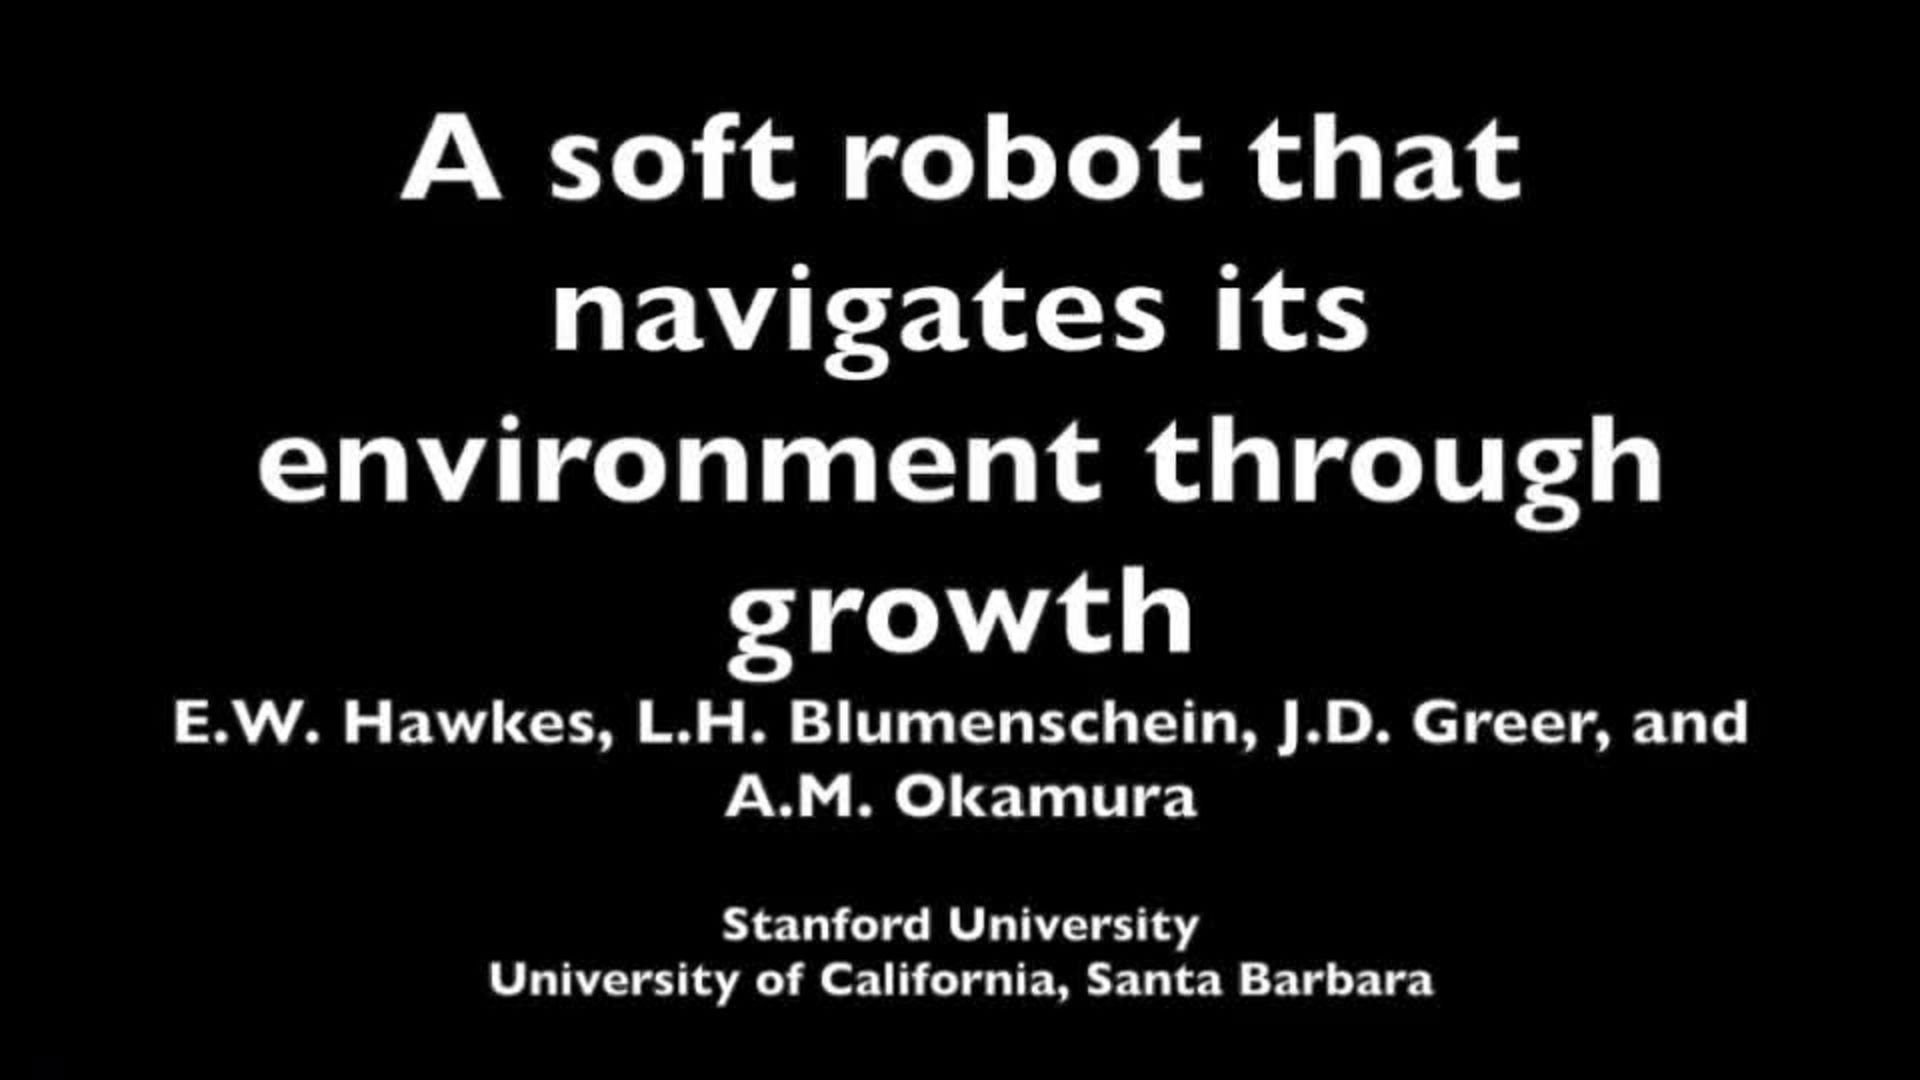 Soft robot growing